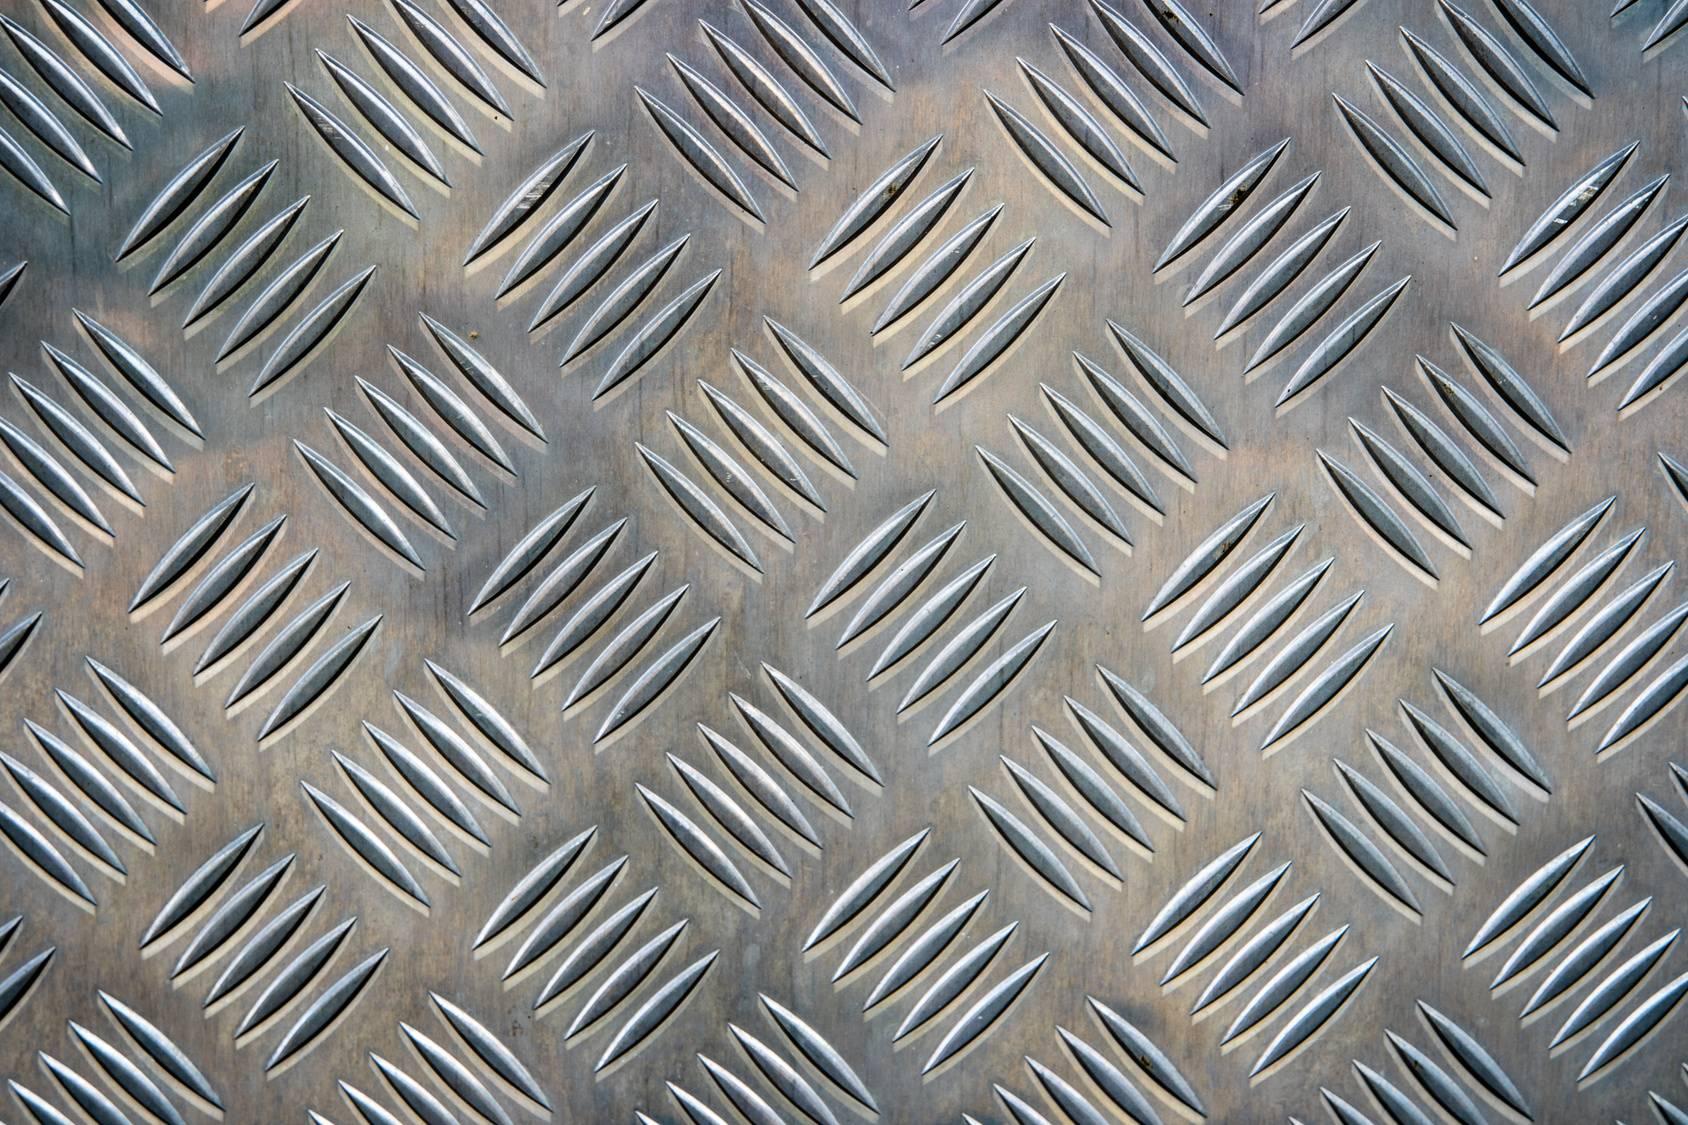 L 39 aluminium t le damier - Tole alu damier ...